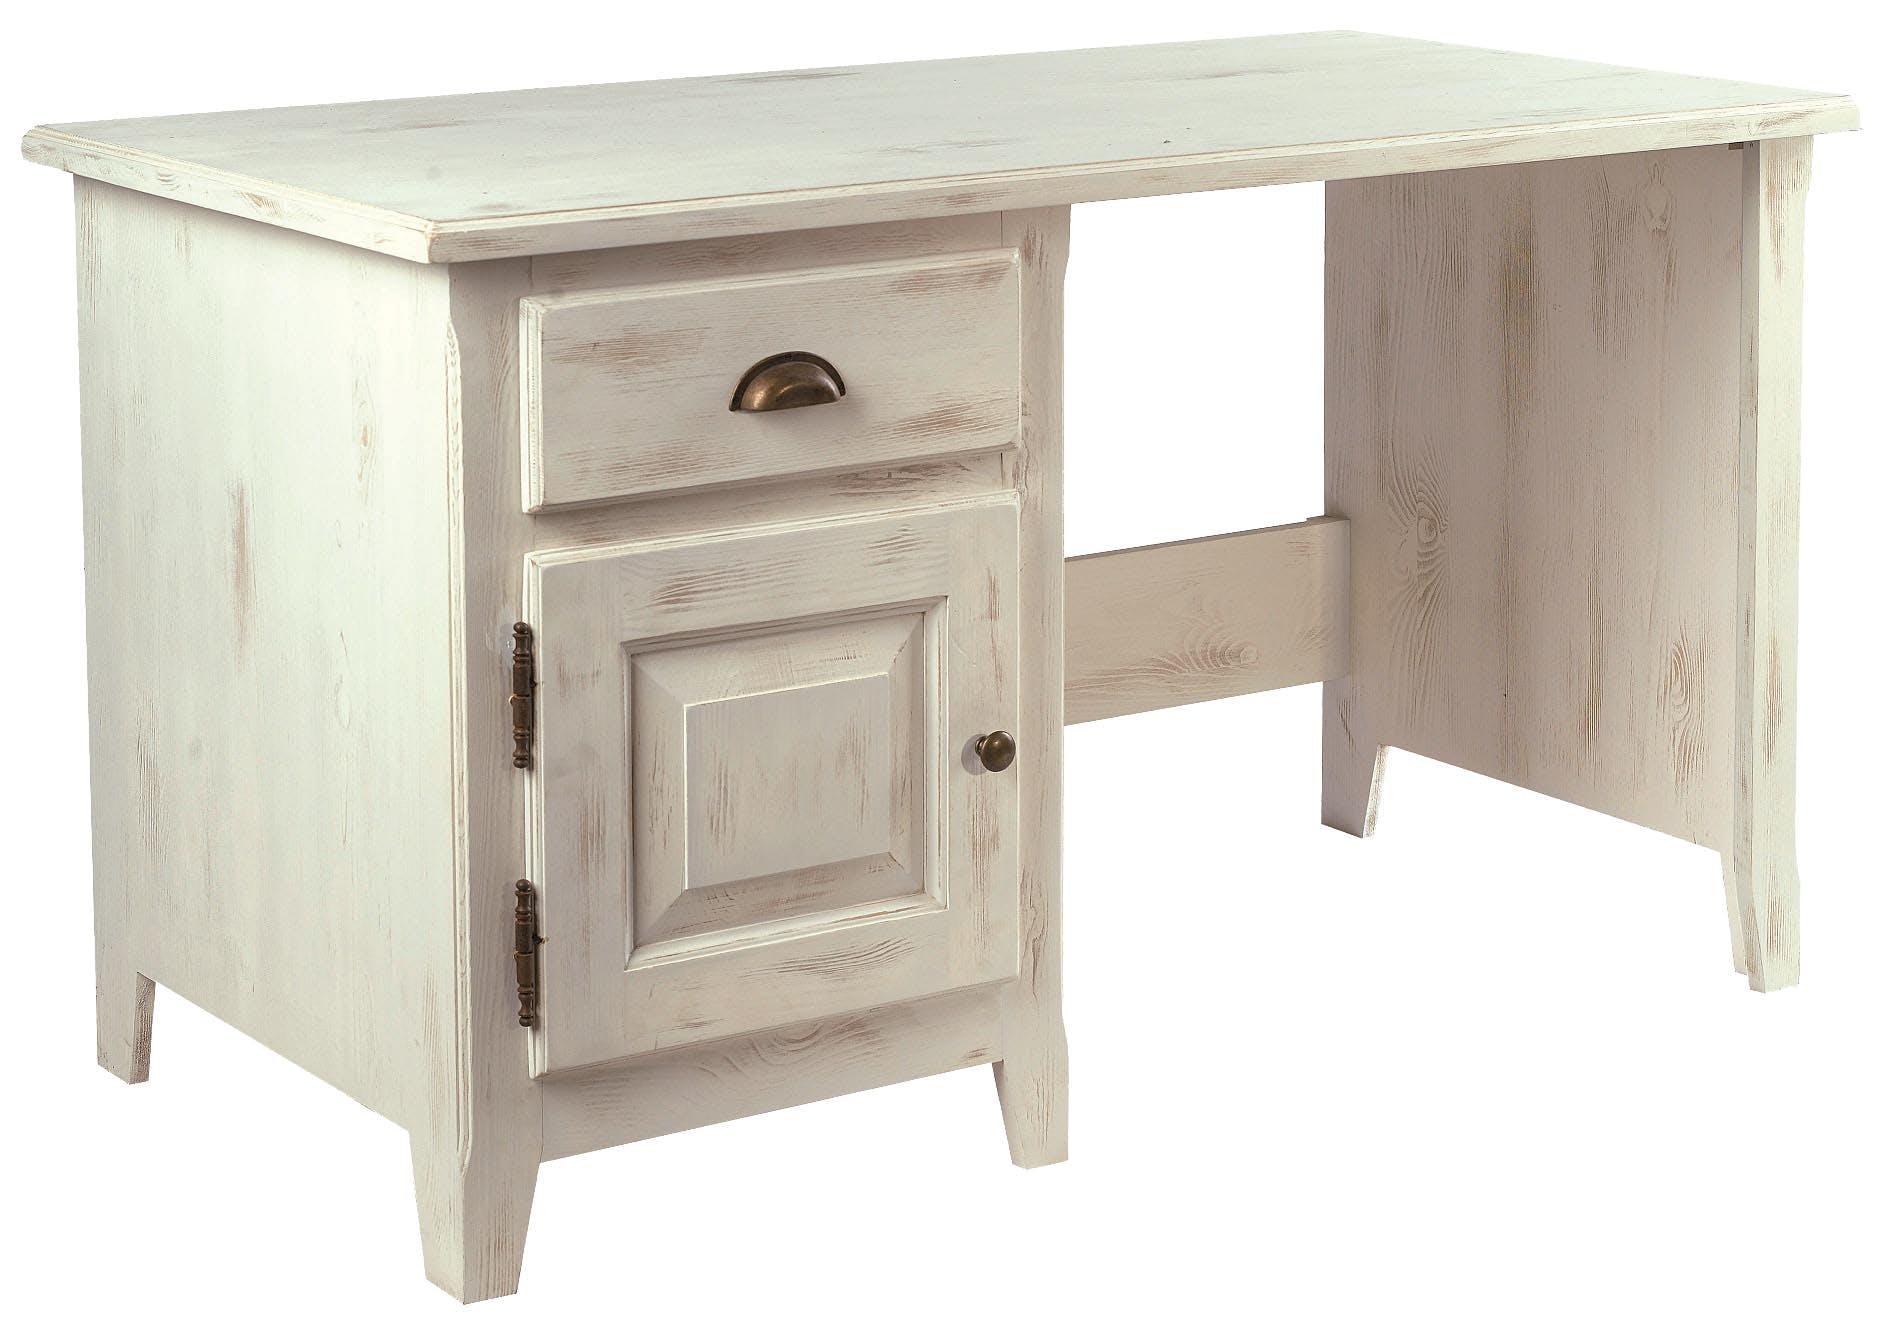 Bureau pin cérusé blanchi 1 porte 1 tiroir 130x66x76cm RIVAGE